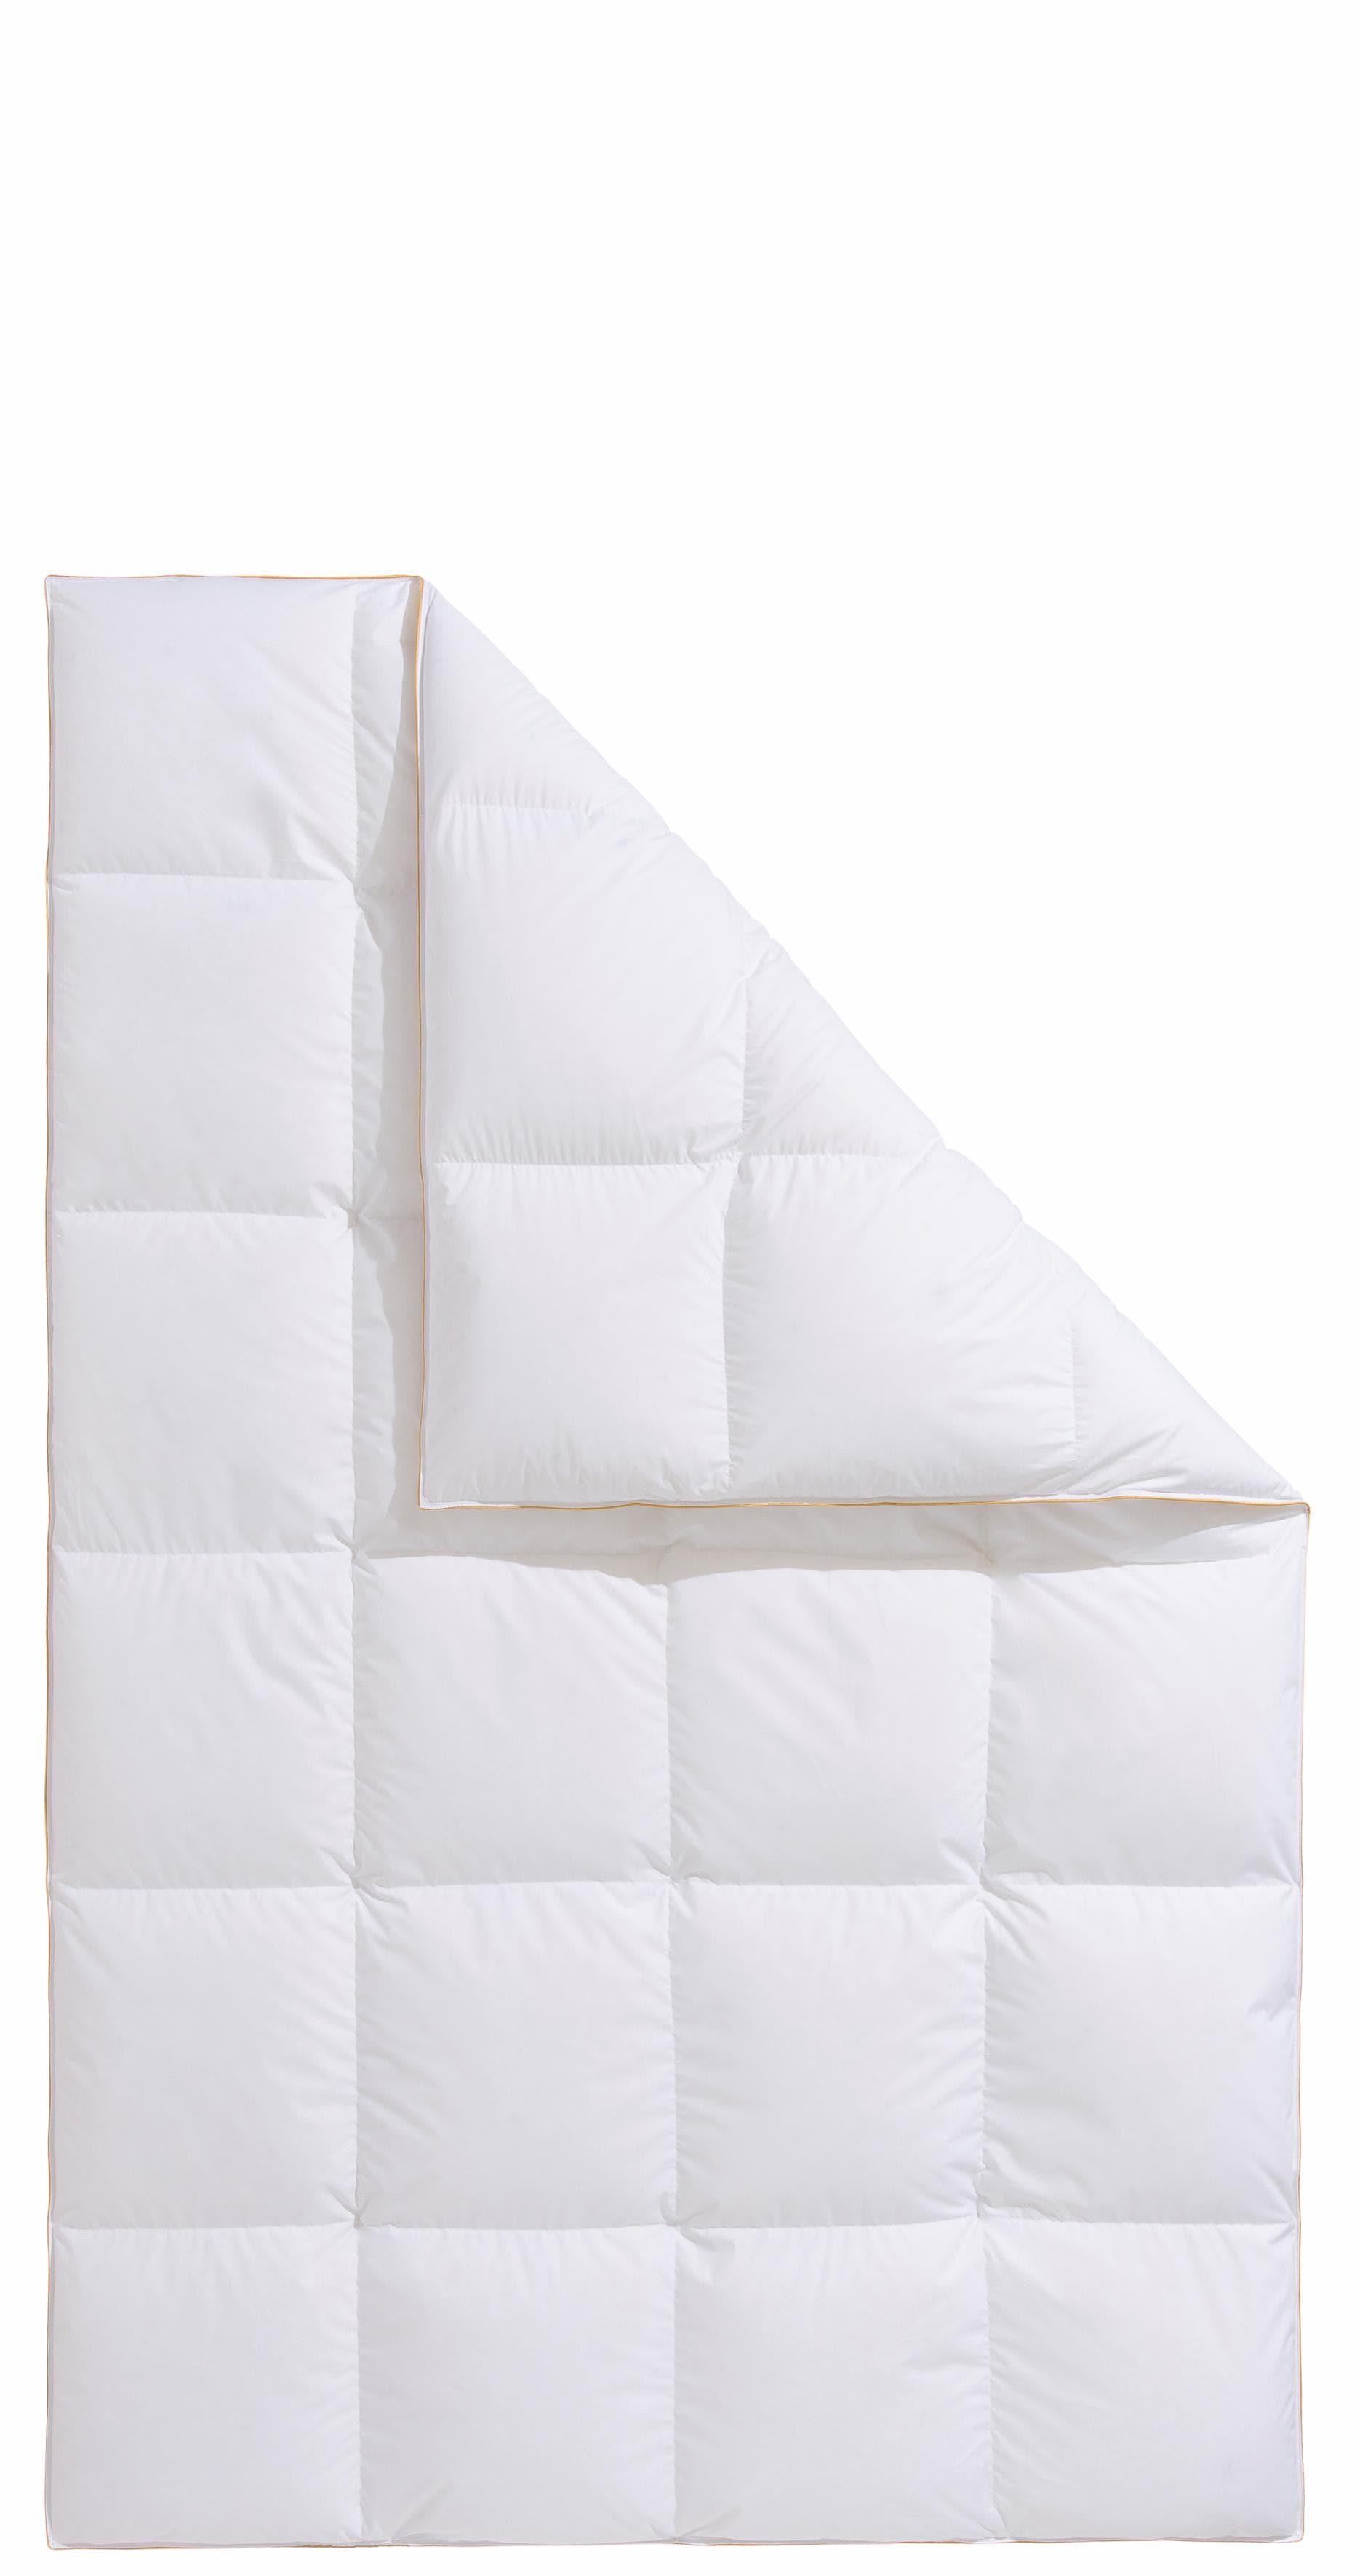 Daunenbettdecke Frau Holle Frau Holle warm Füllung: 100% Daunen Bezug: 100% Baumwolle